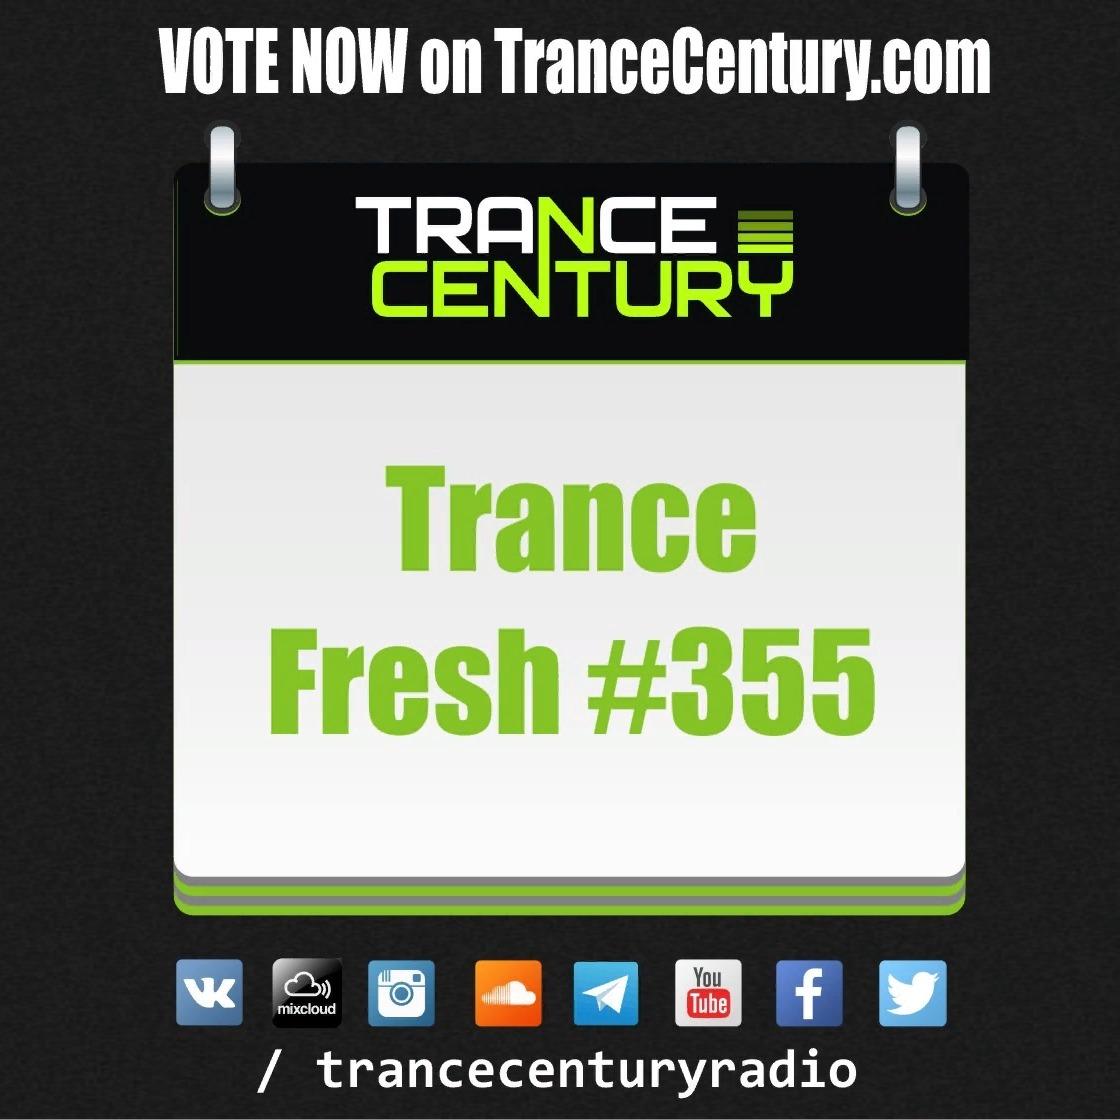 Trance Century Radio - RadioShow #TranceFresh 355